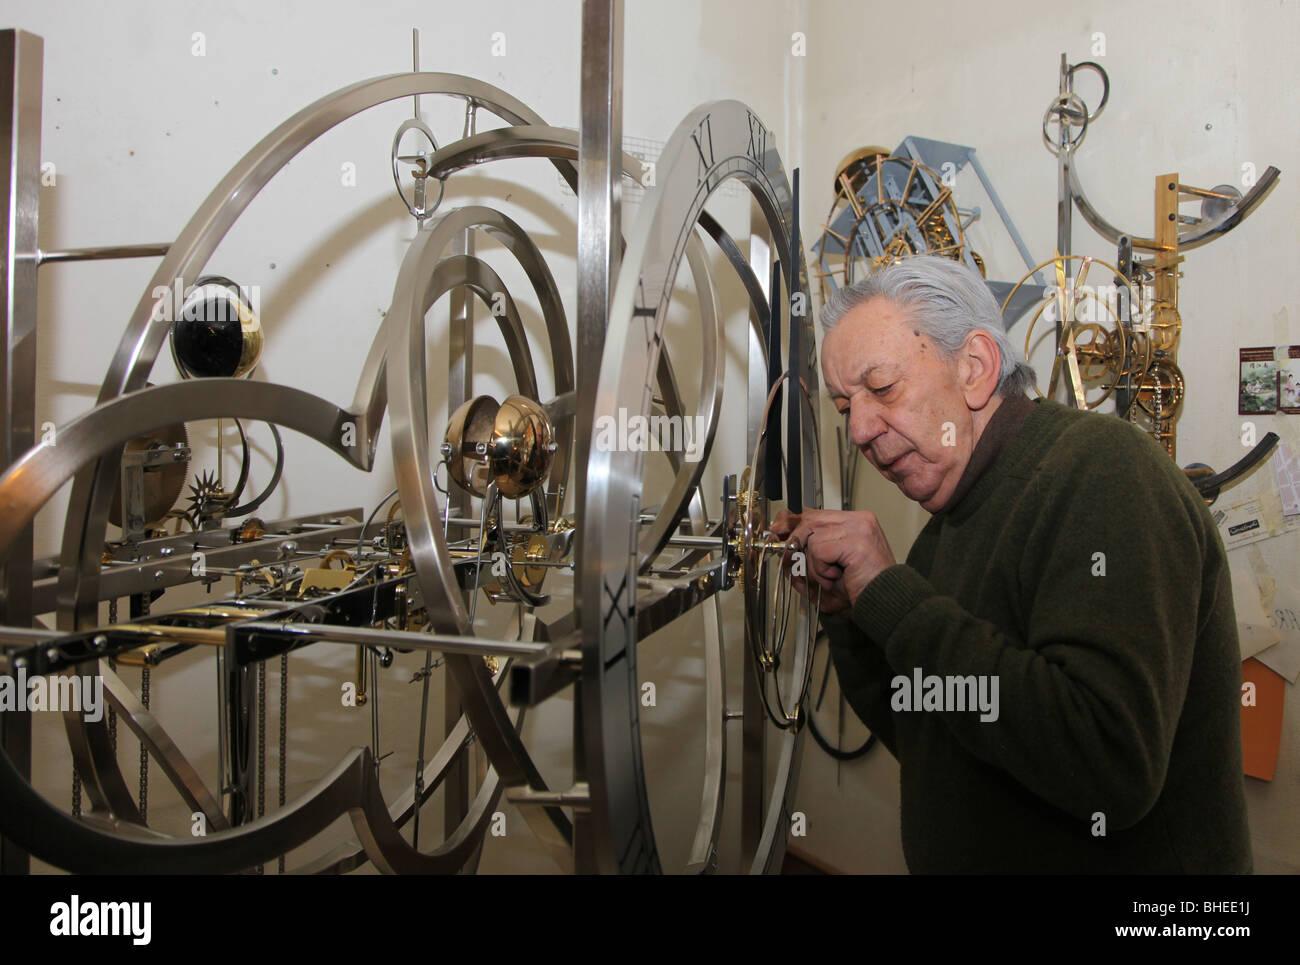 Jean Kazes, master Swiss clockmaker with clock bound for Clochard, New York; Carouge, Geneva, Switzerland - Stock Image